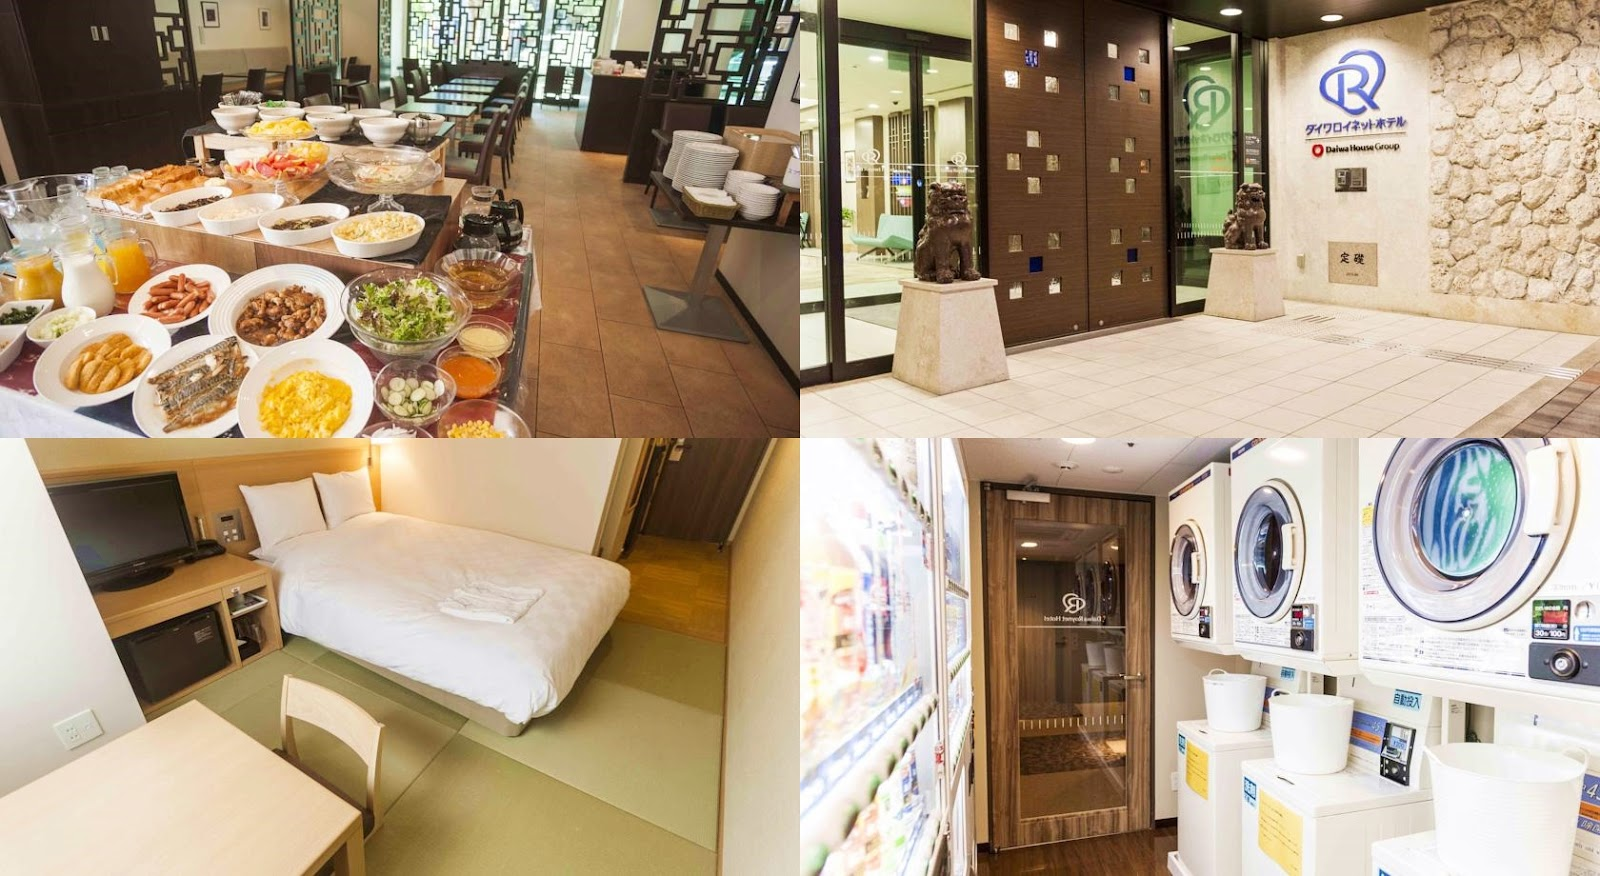 沖繩-住宿-推薦-飯店-旅館-民宿-公寓-那霸-縣廳前大和ROYNET酒店-Daiwa-Roynet-Hotel-Okinawa-Kenchomae-Okinawa-hotel-recommendation